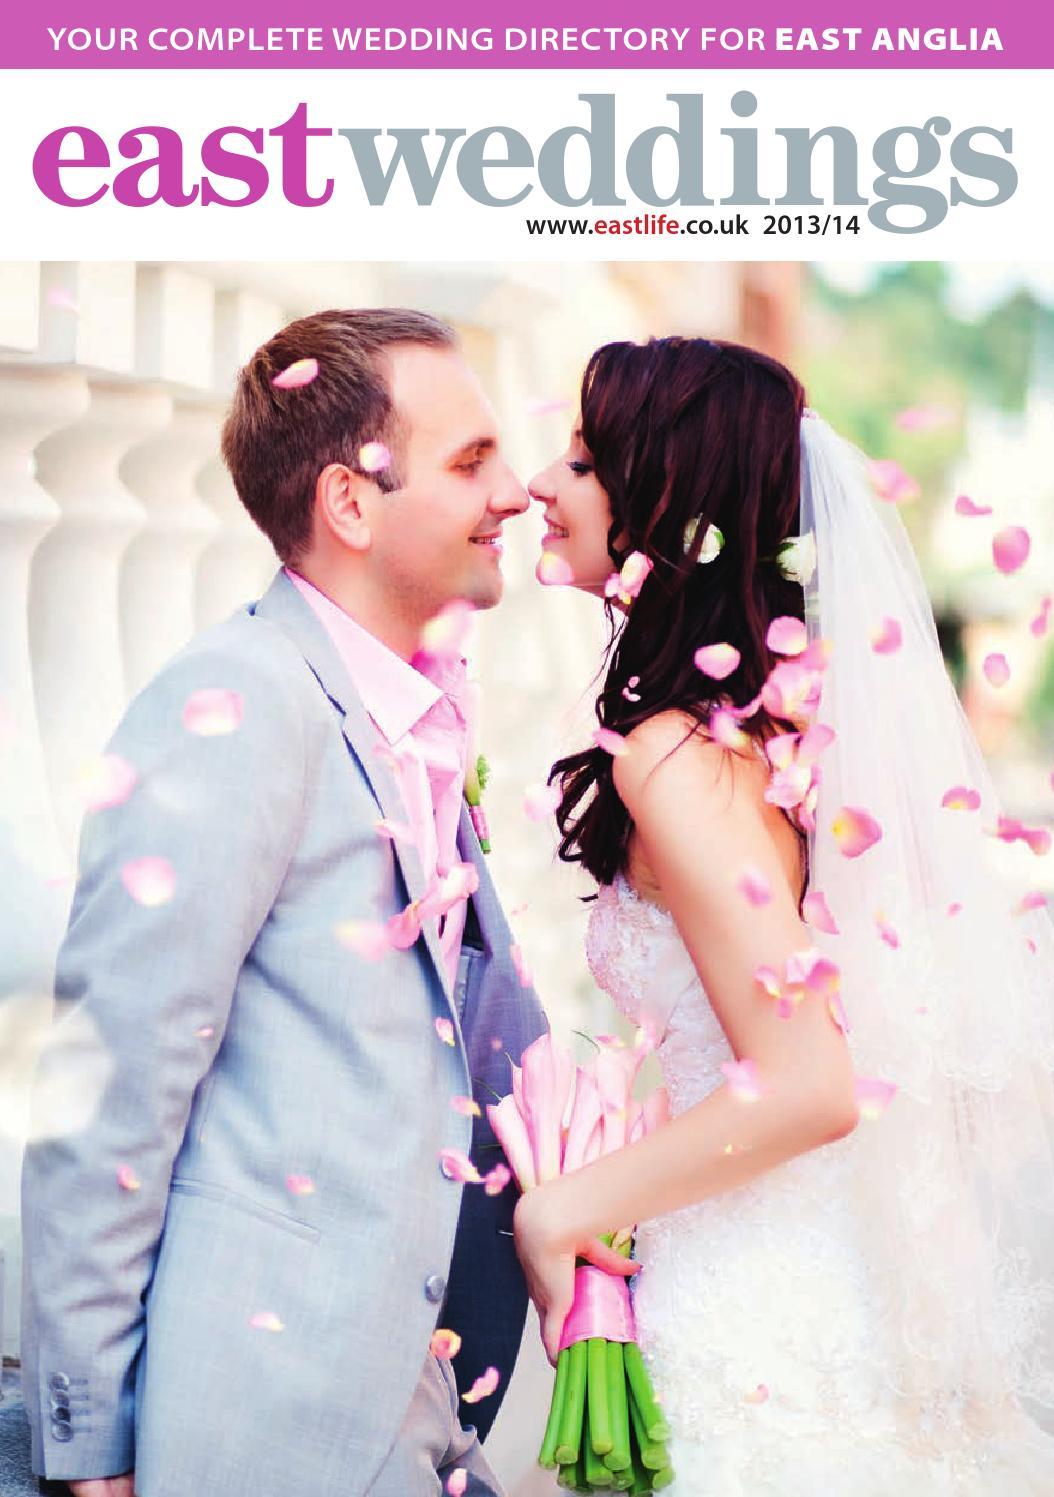 Jim leishman wedding